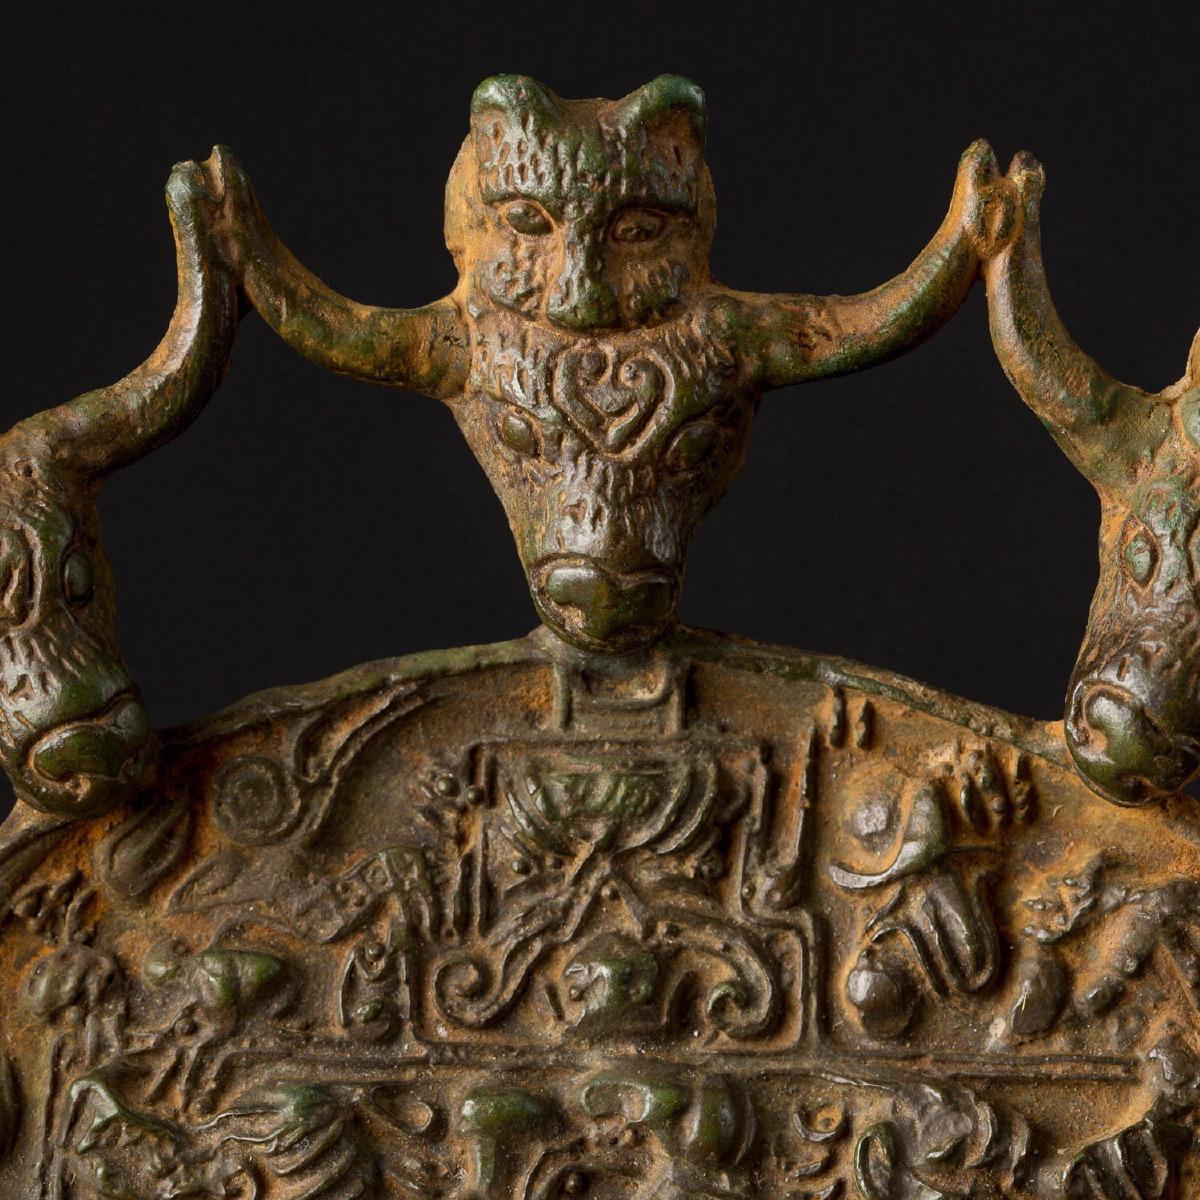 Photo of bronze-mirror-buffalos-and-felines-heads-dian-kingdom-han-dynasty-galerie-golconda